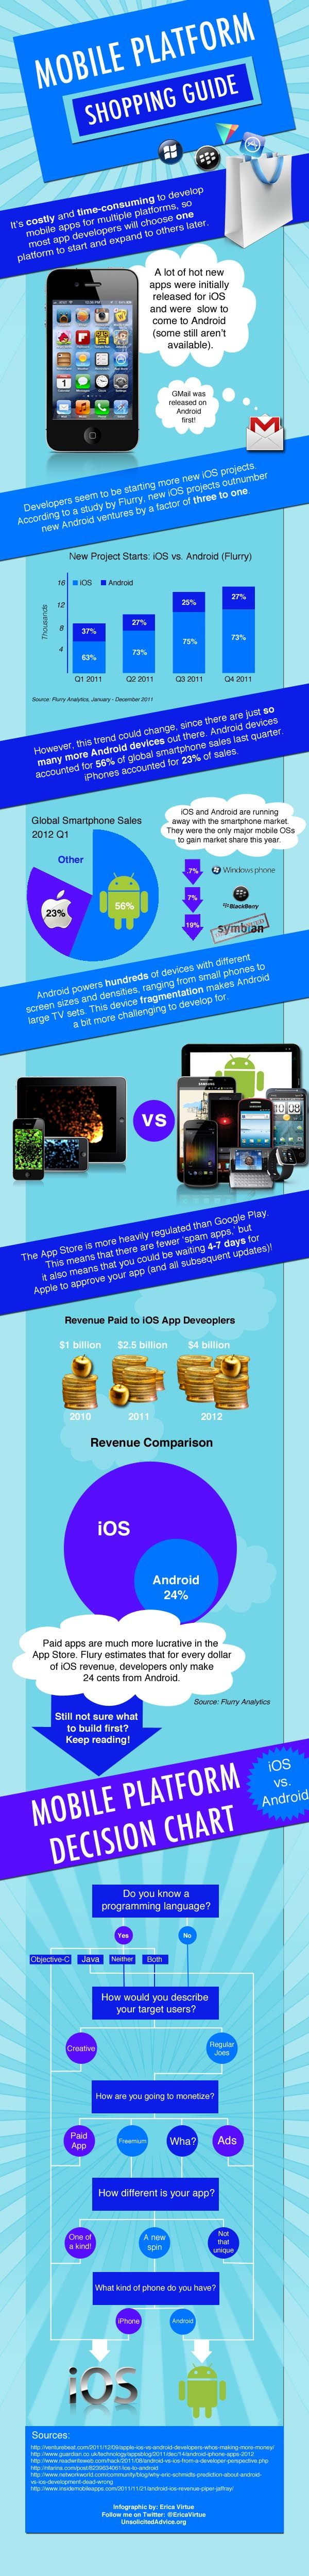 Mobile Platform Shopping Guide: Mobiles Os, Guide Mobiles, Mobiles Development, Mobiles App, Gas Mobiles, Mobiles Platform, Mobiles Infographic, Mobiles Marketing, Development Mobiles